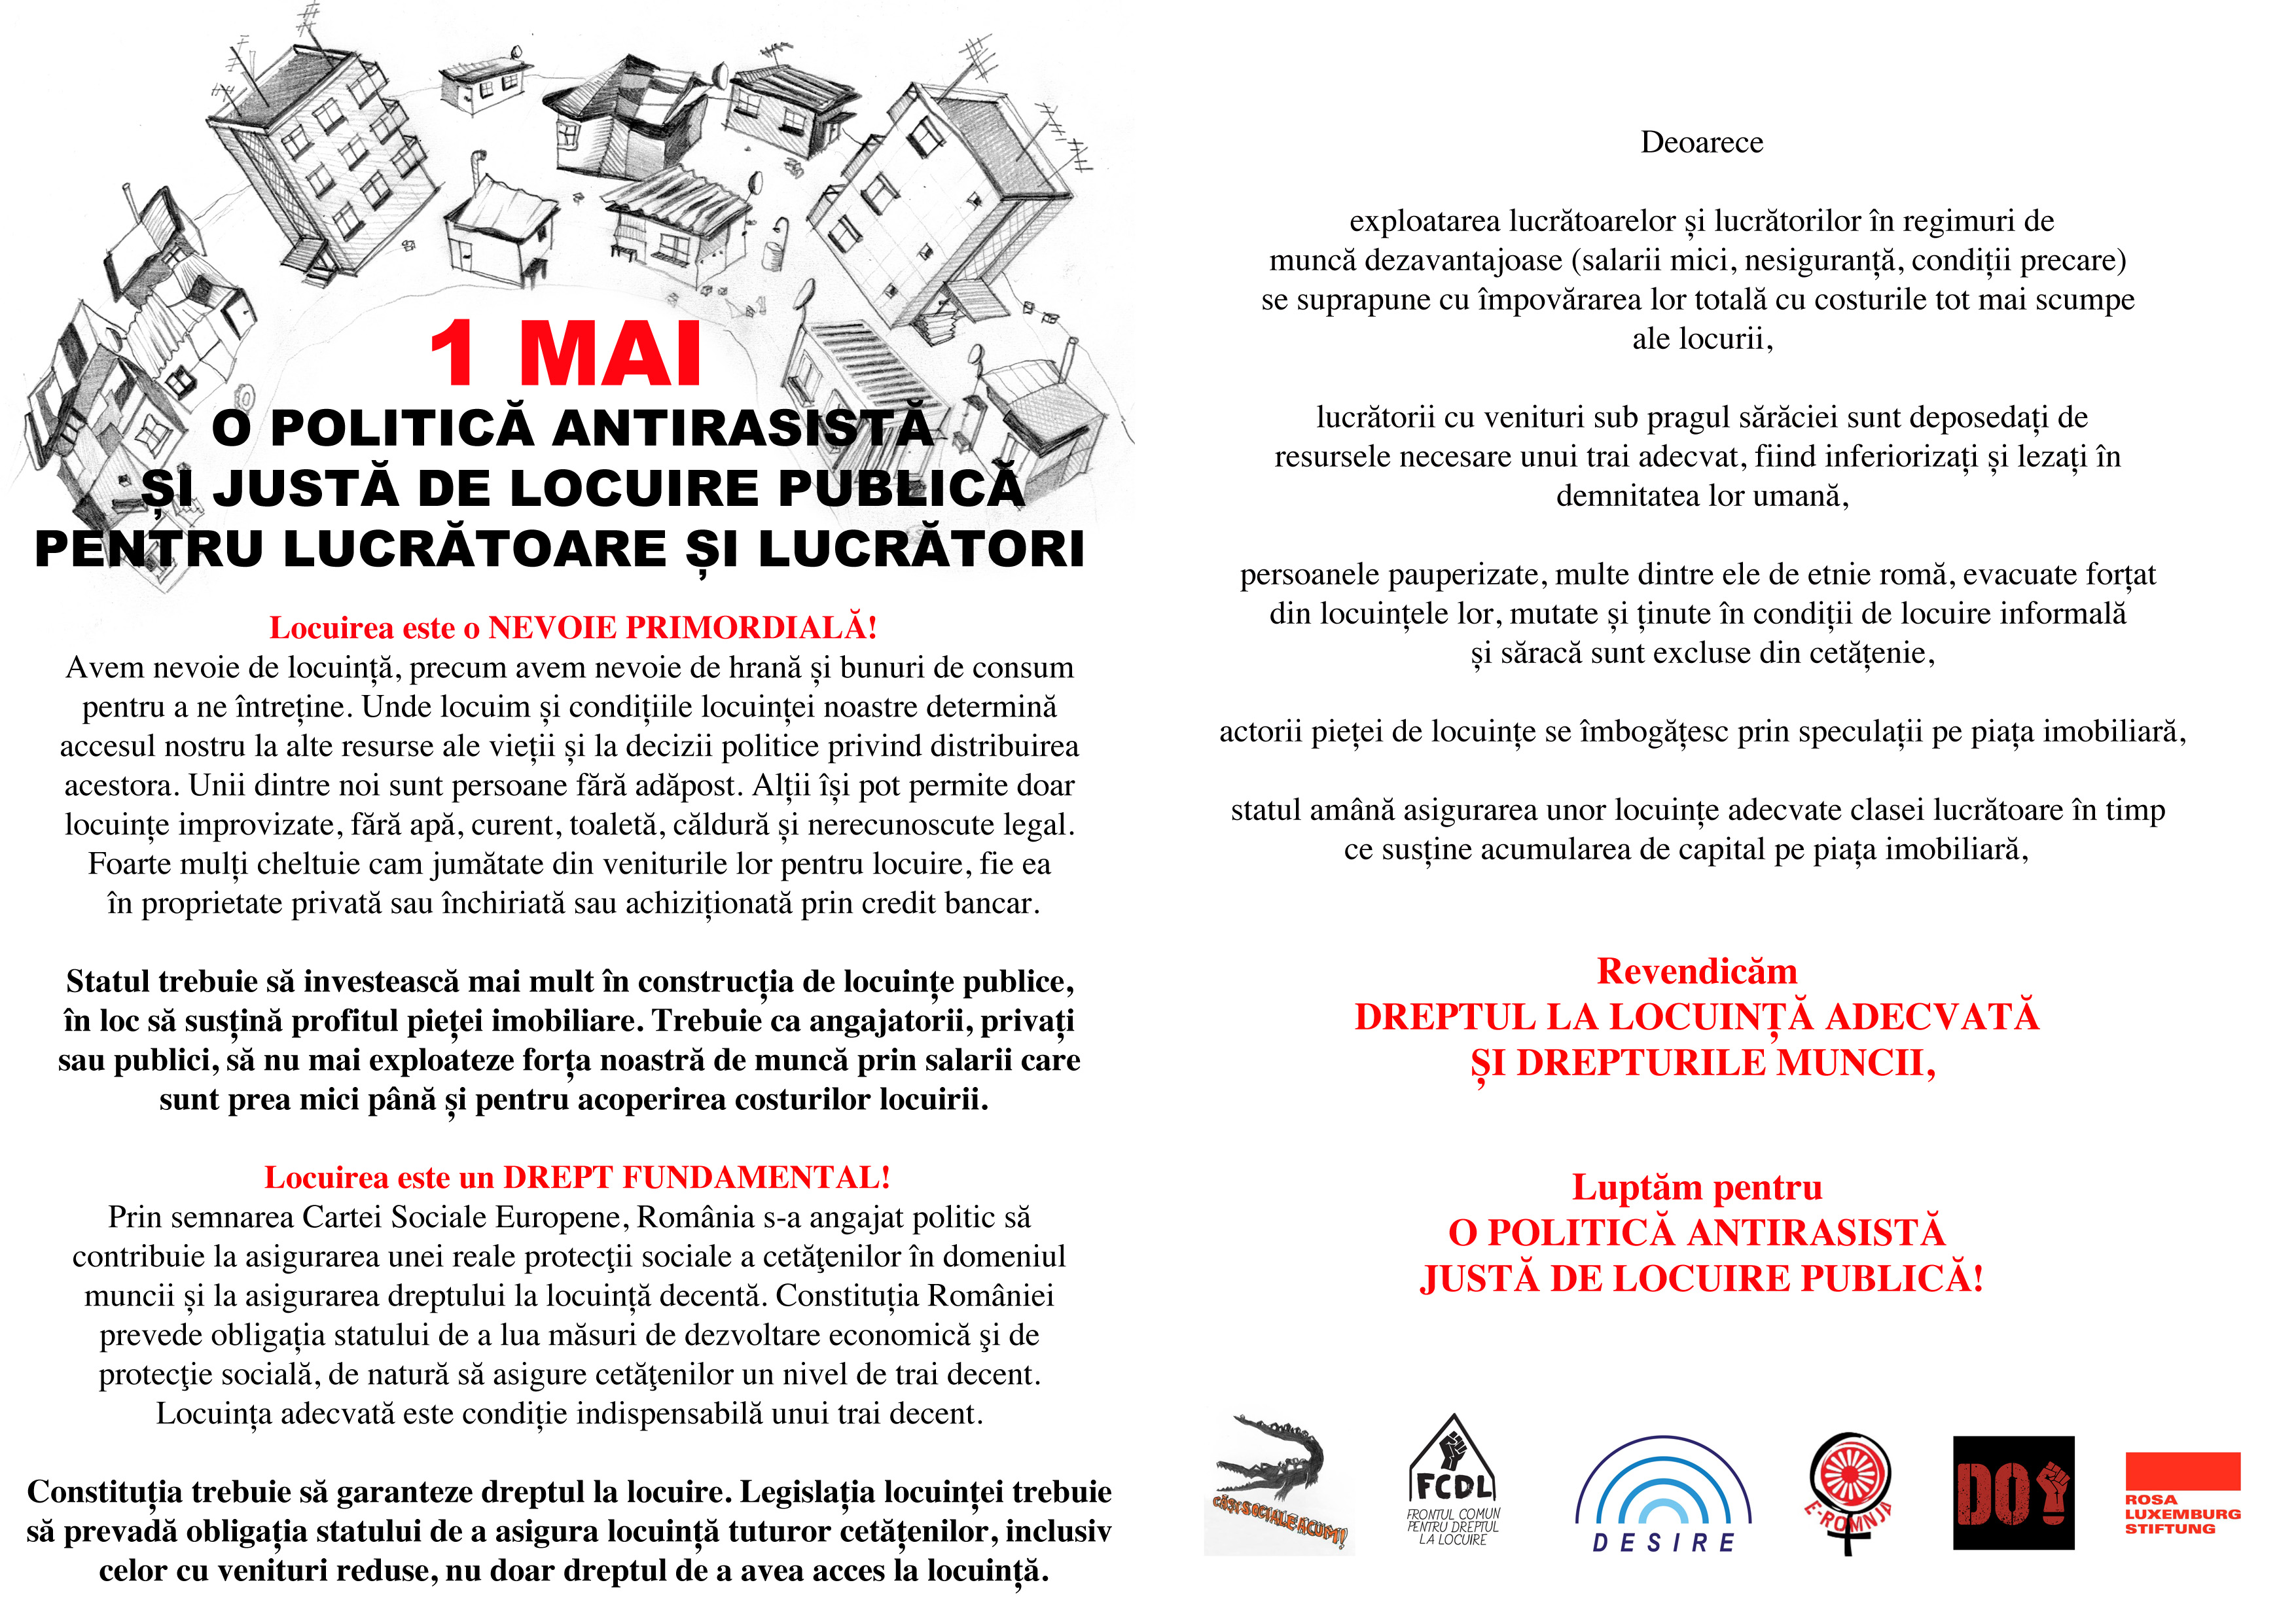 flyer-1-mai_munca-si-locuire